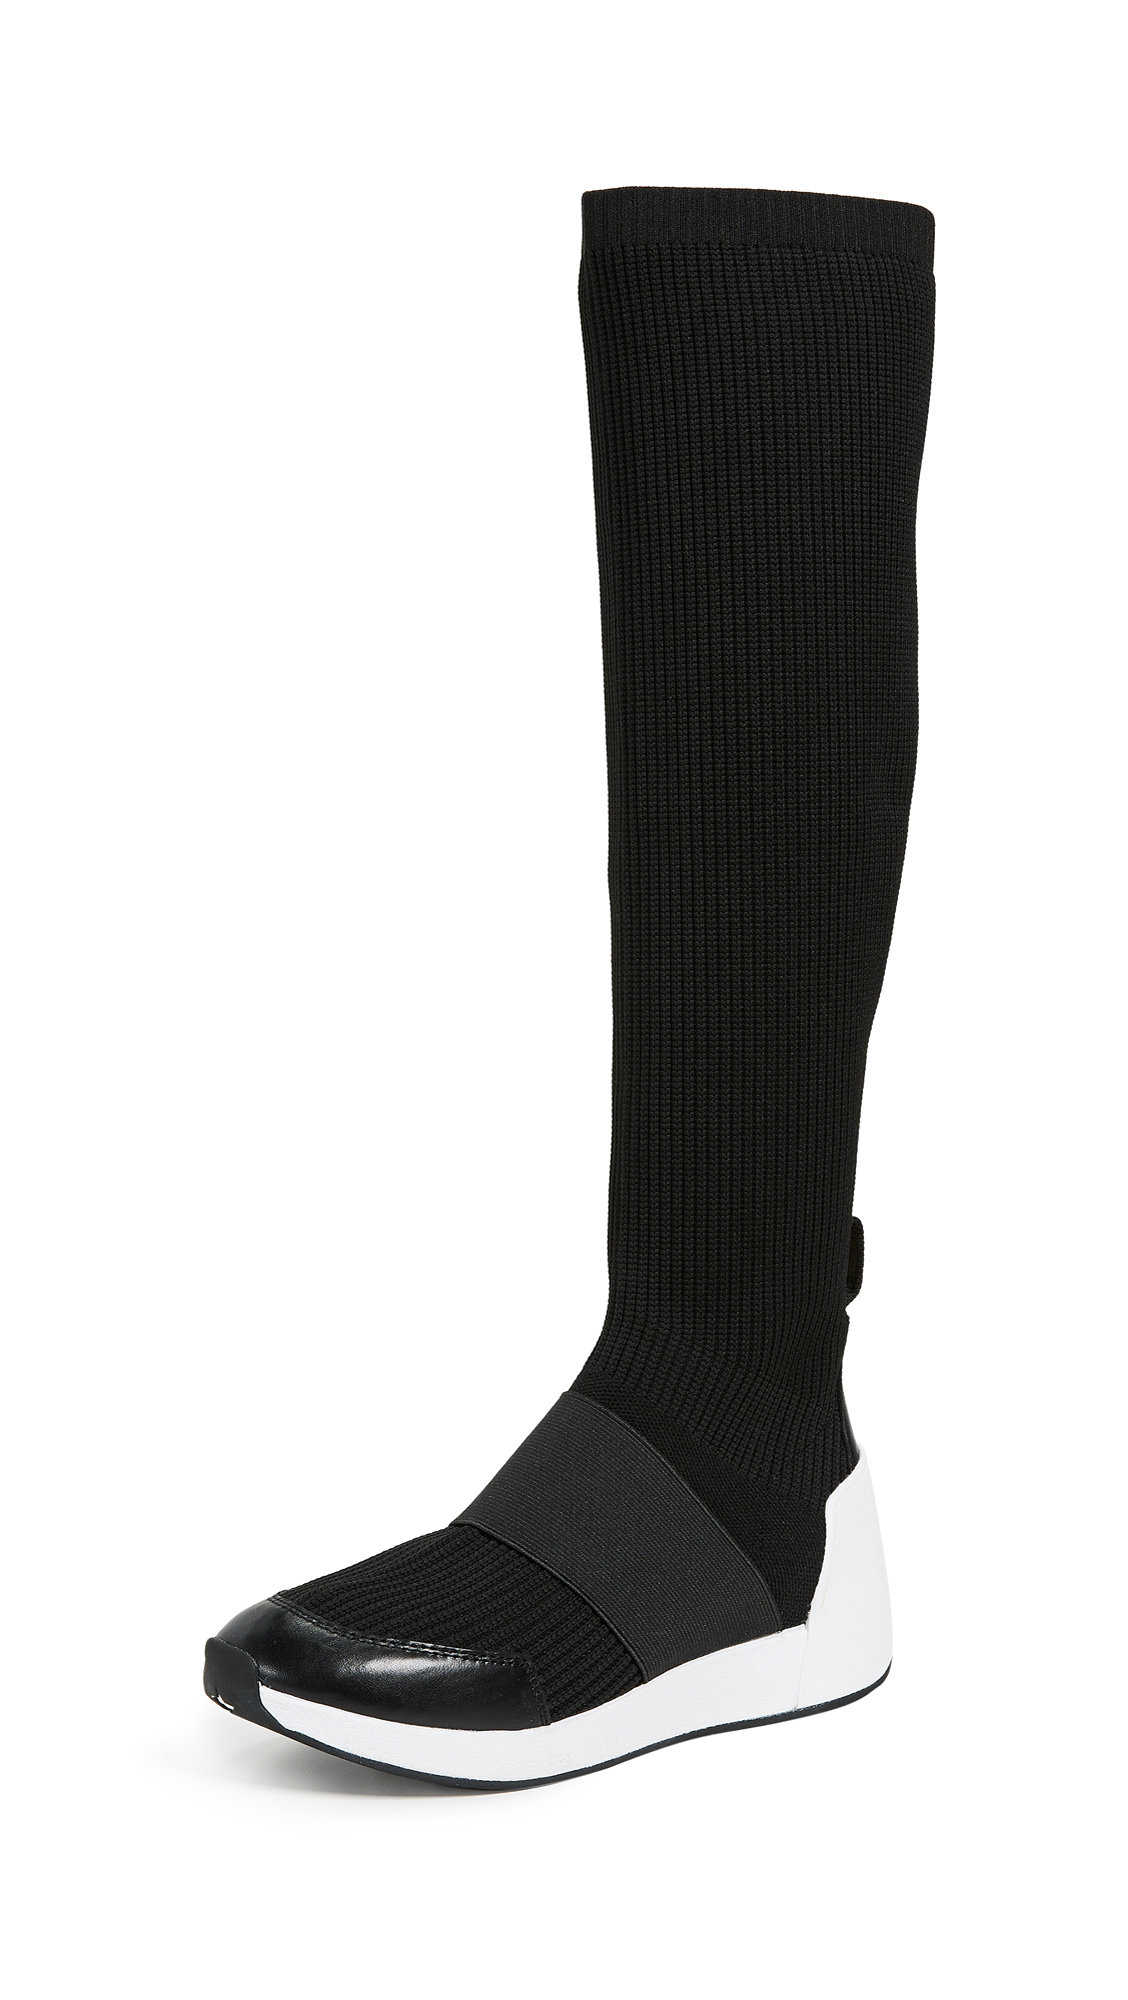 Ash Jezebel Hi Sneakers - Black/Black